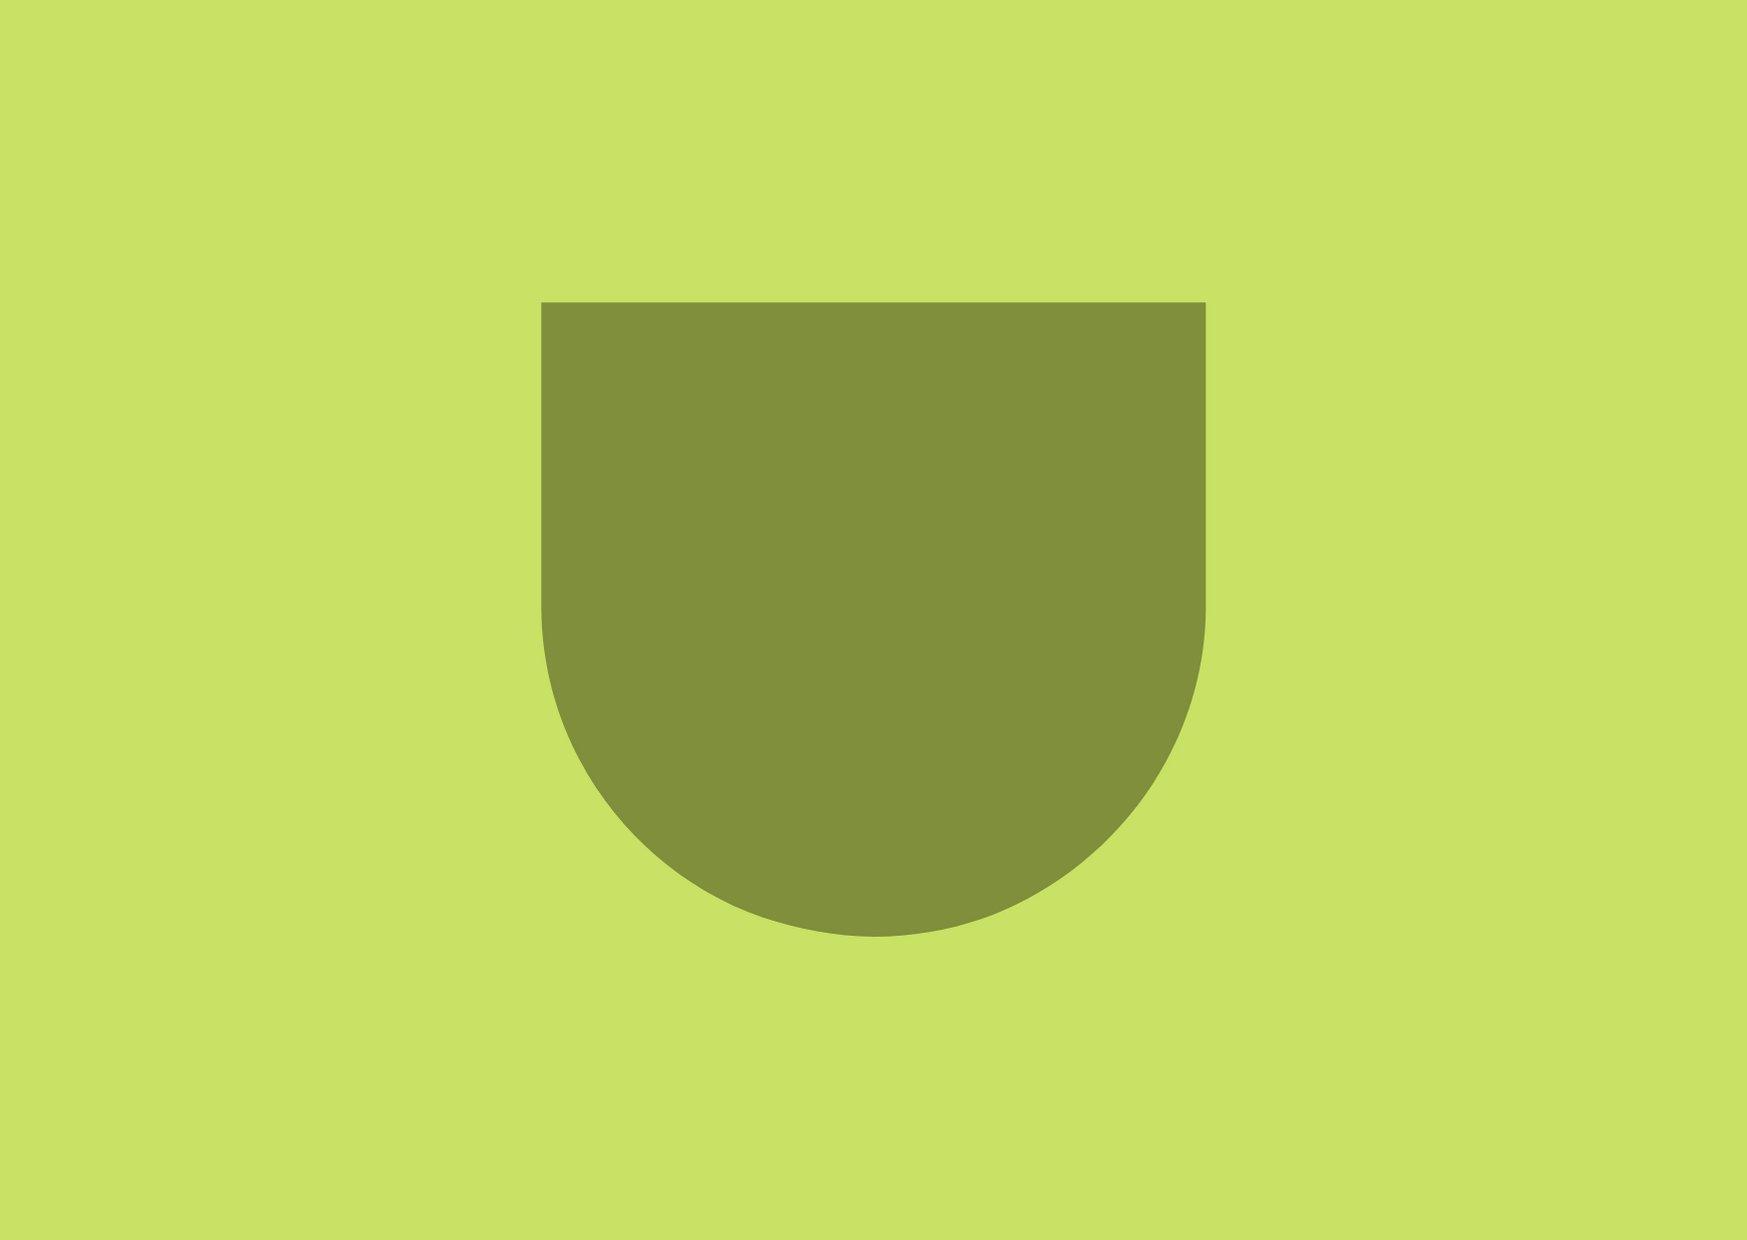 diseño simple